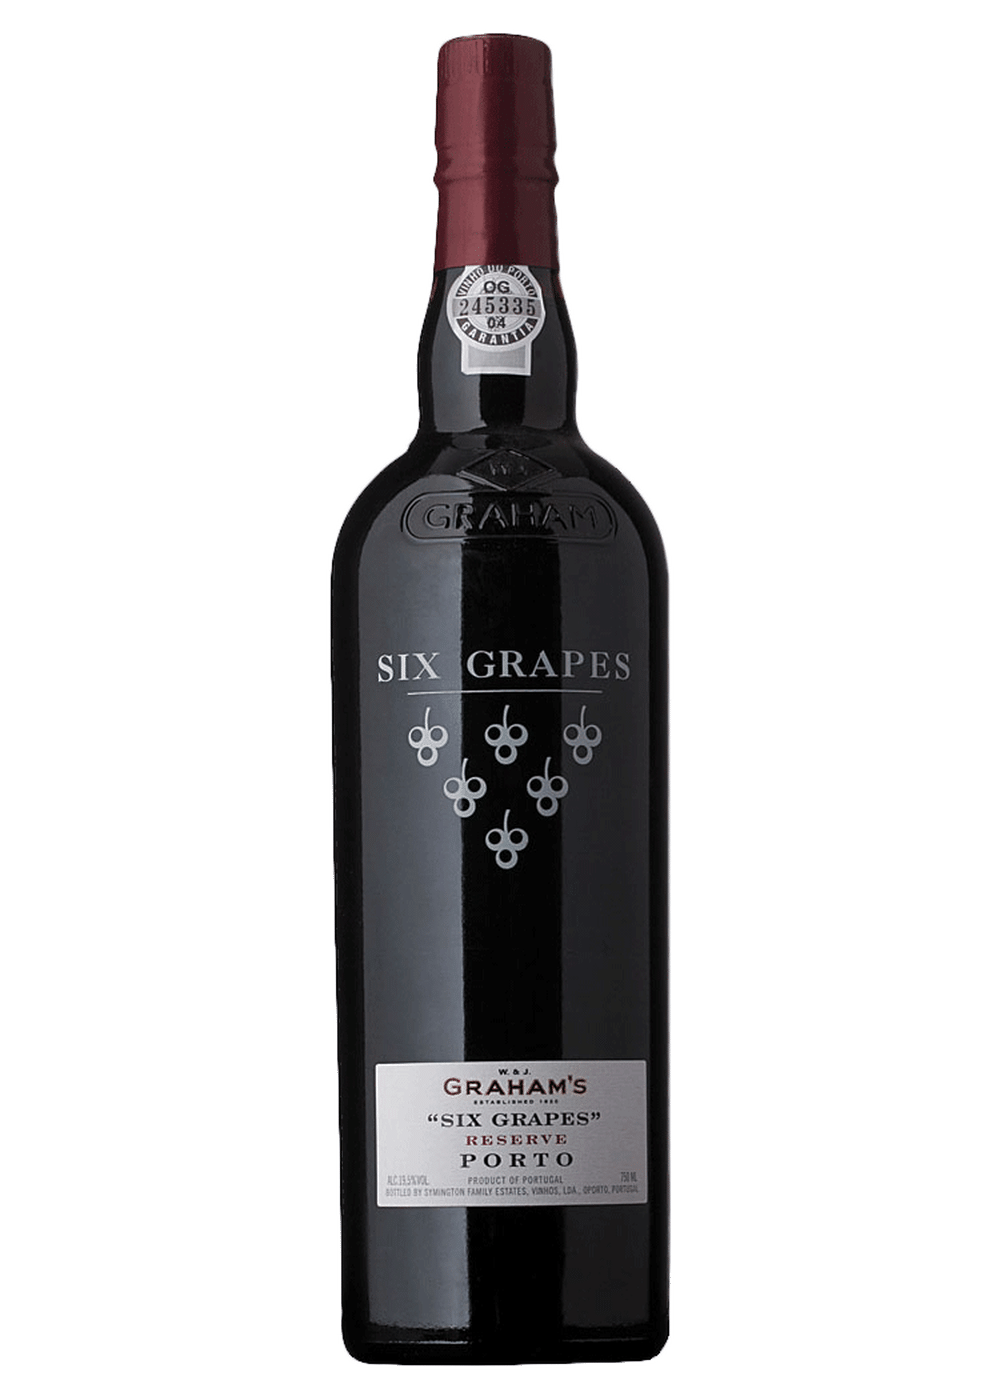 Grahams Porto Six Grapes 750ml